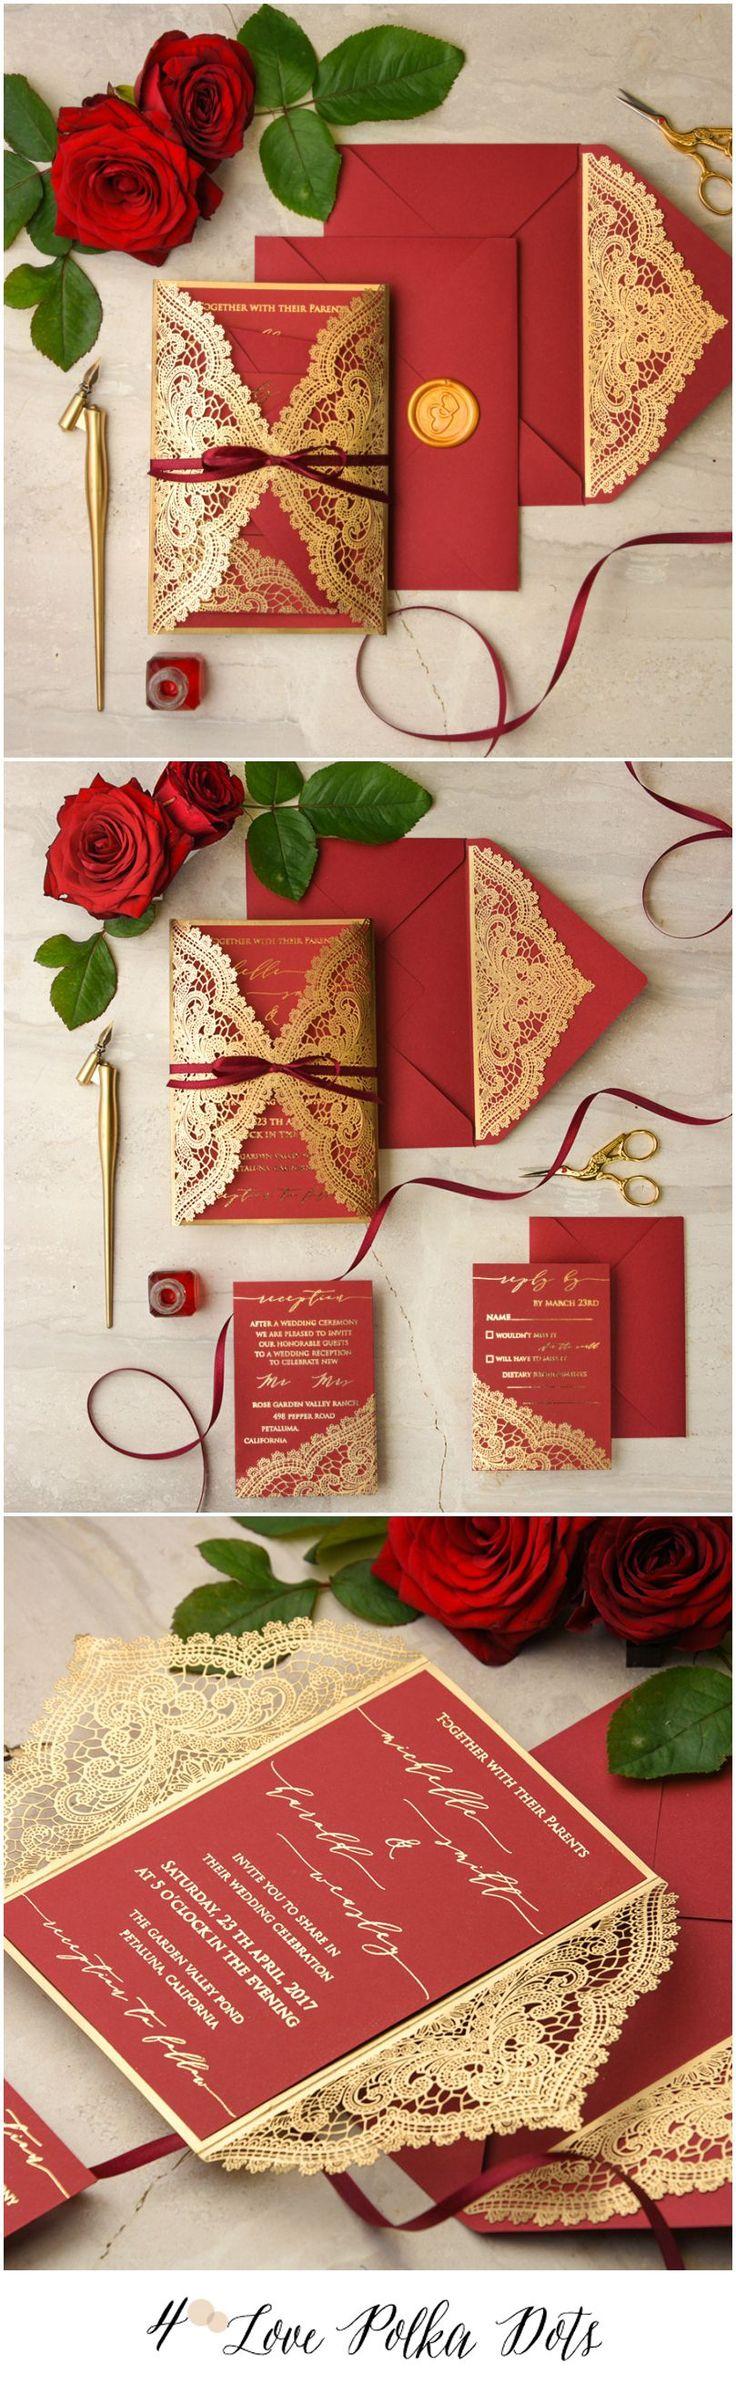 Colorful Handmade Wedding Invitations Sydney Frieze - Invitations ...